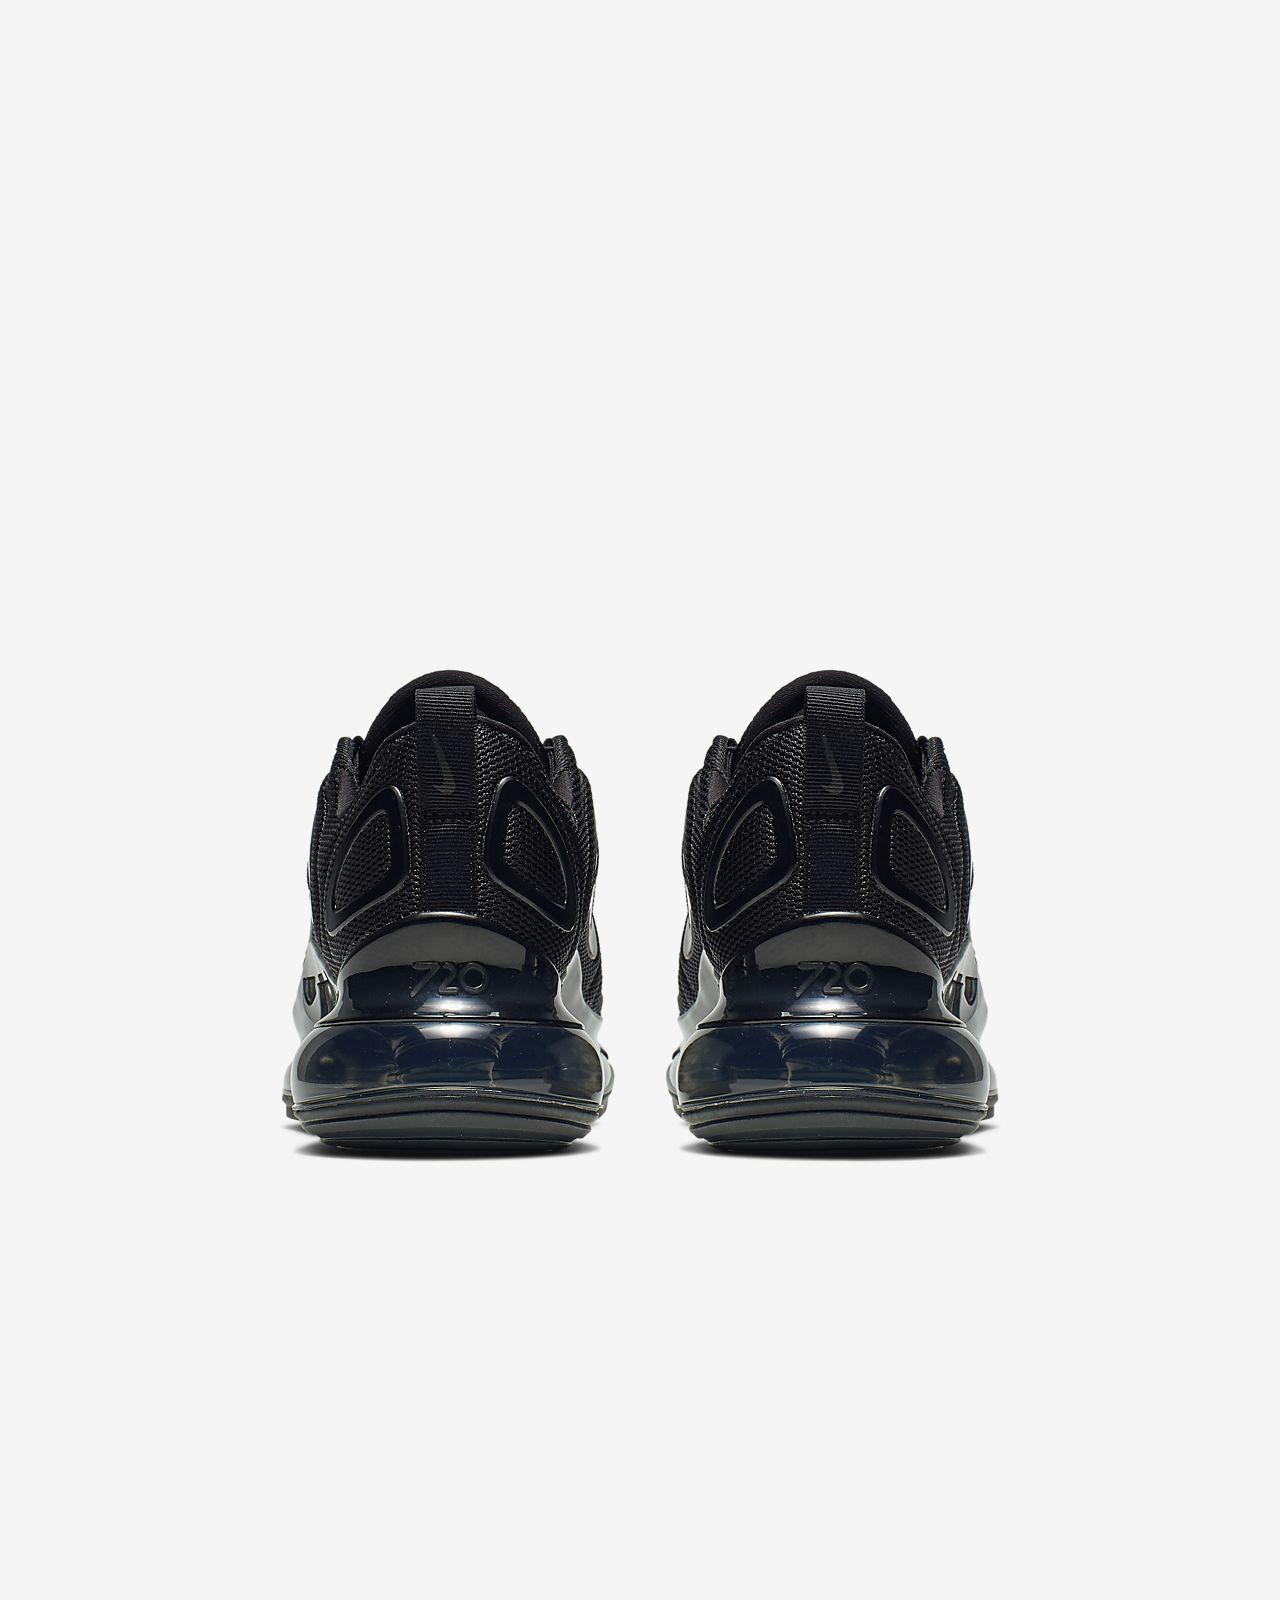 Go bigger with Nike Air Max 720 Nike & Zalando   Kids